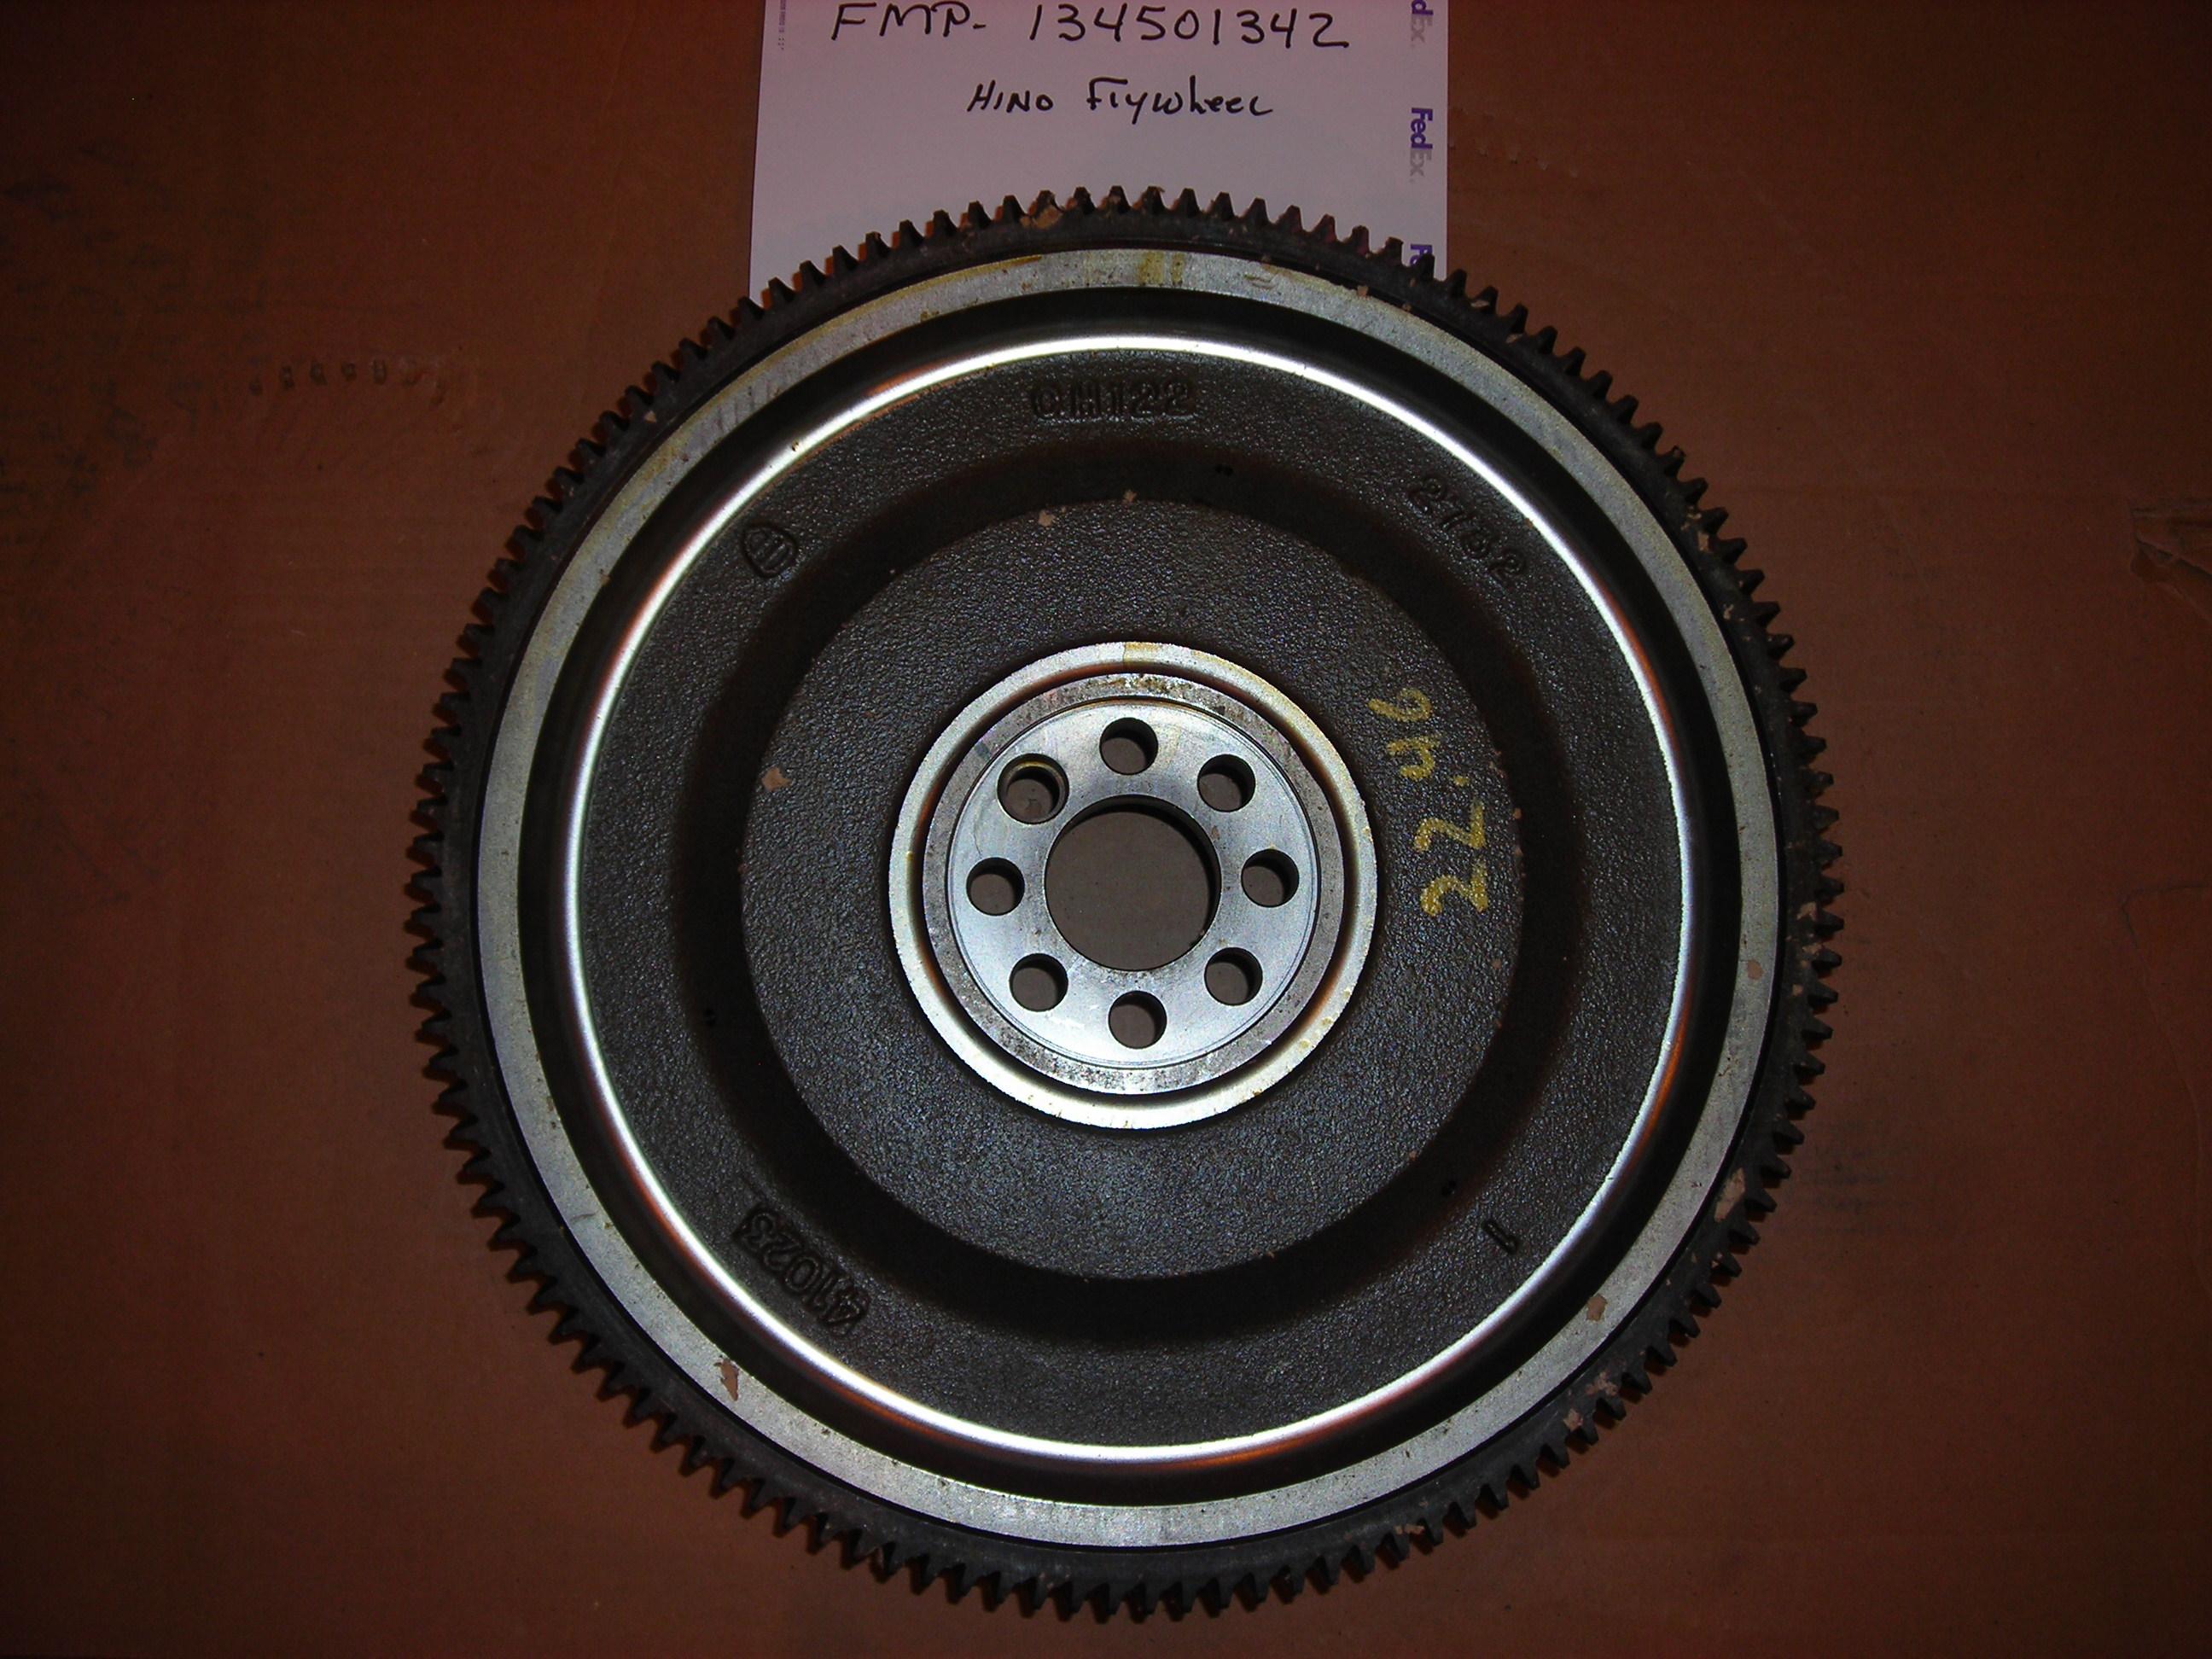 134501342 Hino Flywheel Rear